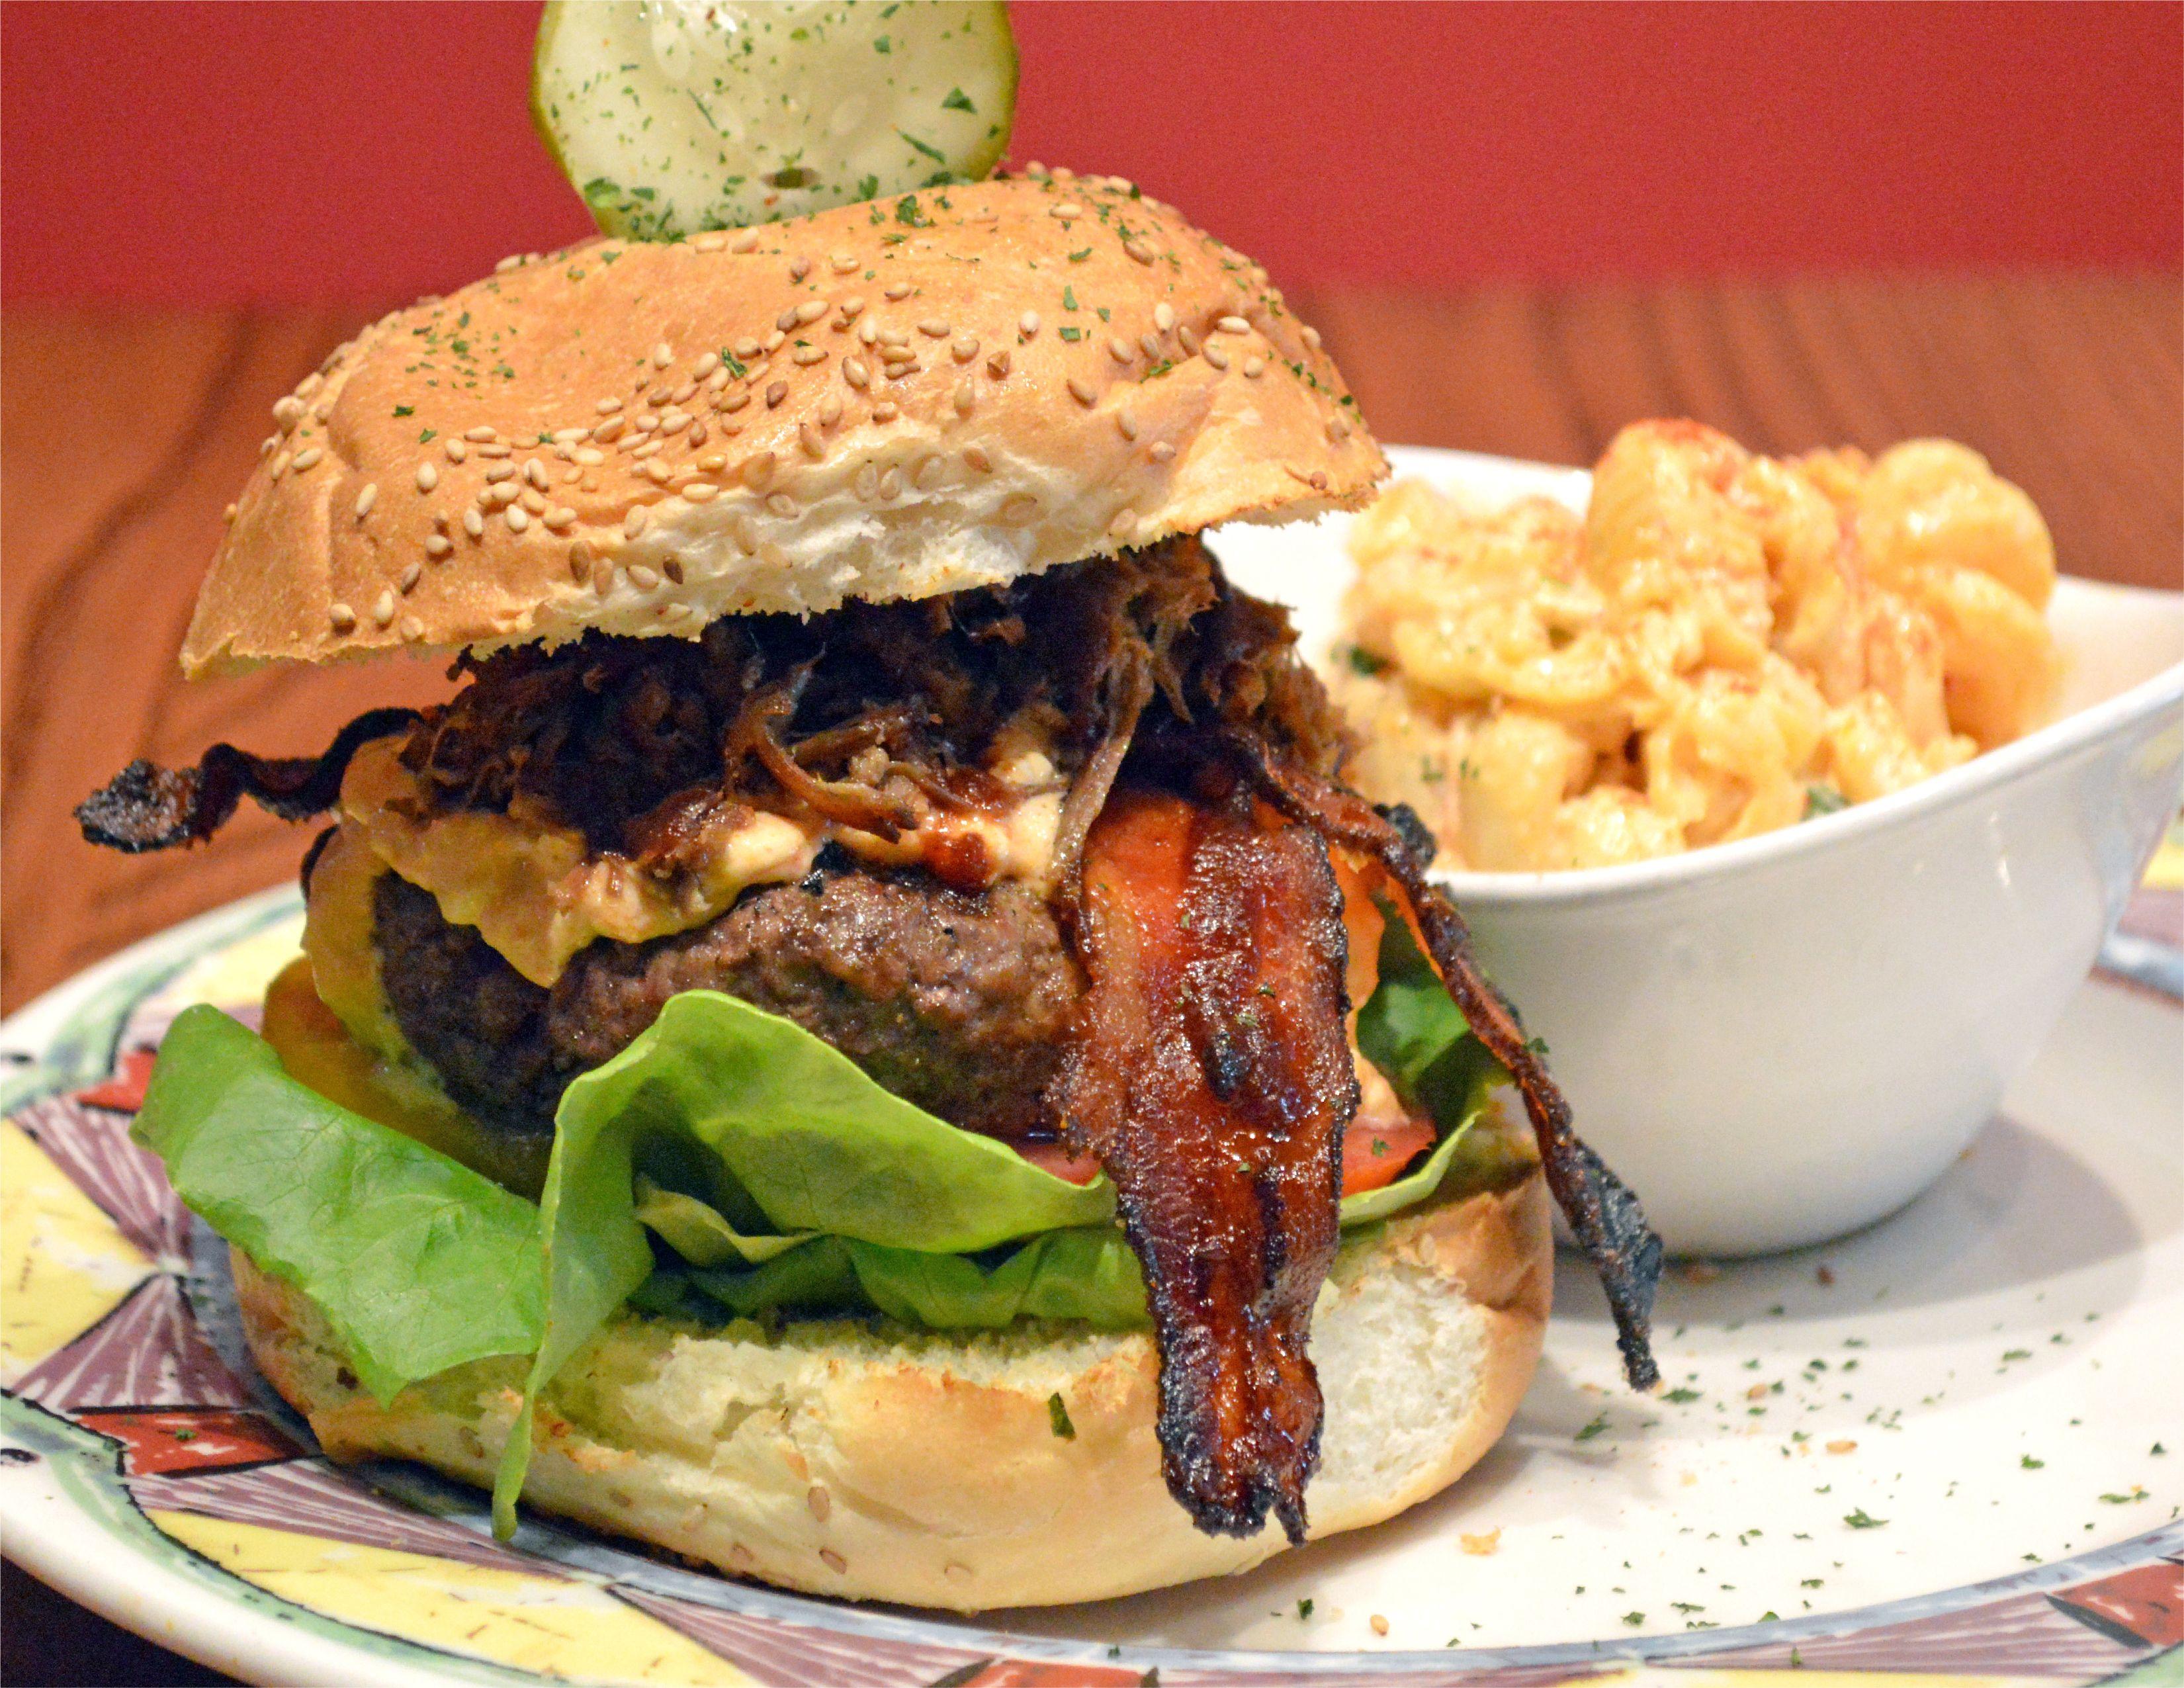 BOOM BURGER 8 oz. Burger with a mix of local Roseda Farm